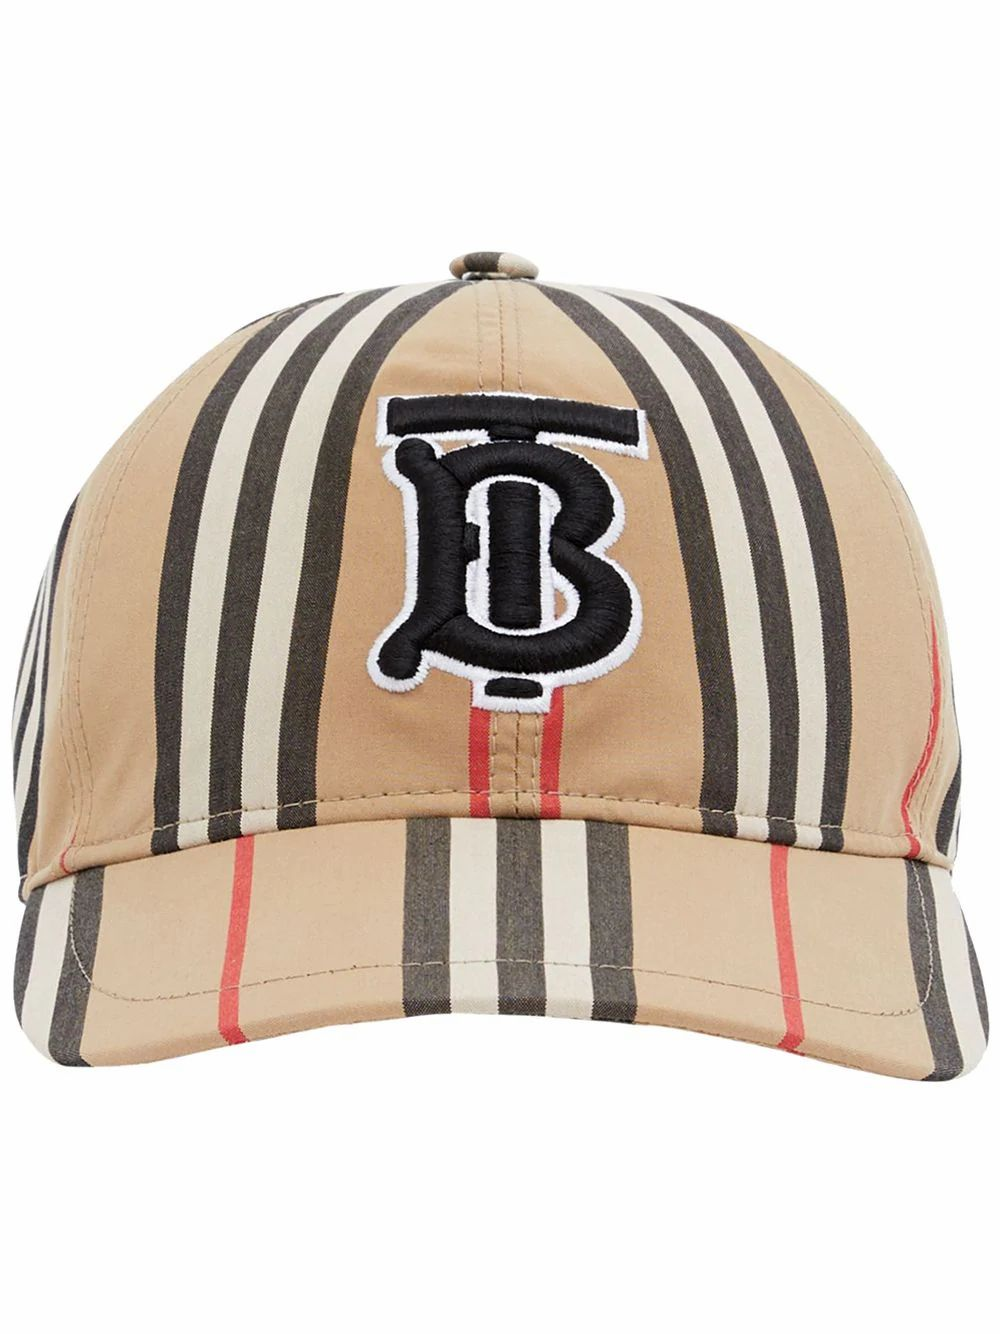 BURBERRY BURBERRY MEN'S BEIGE COTTON HAT